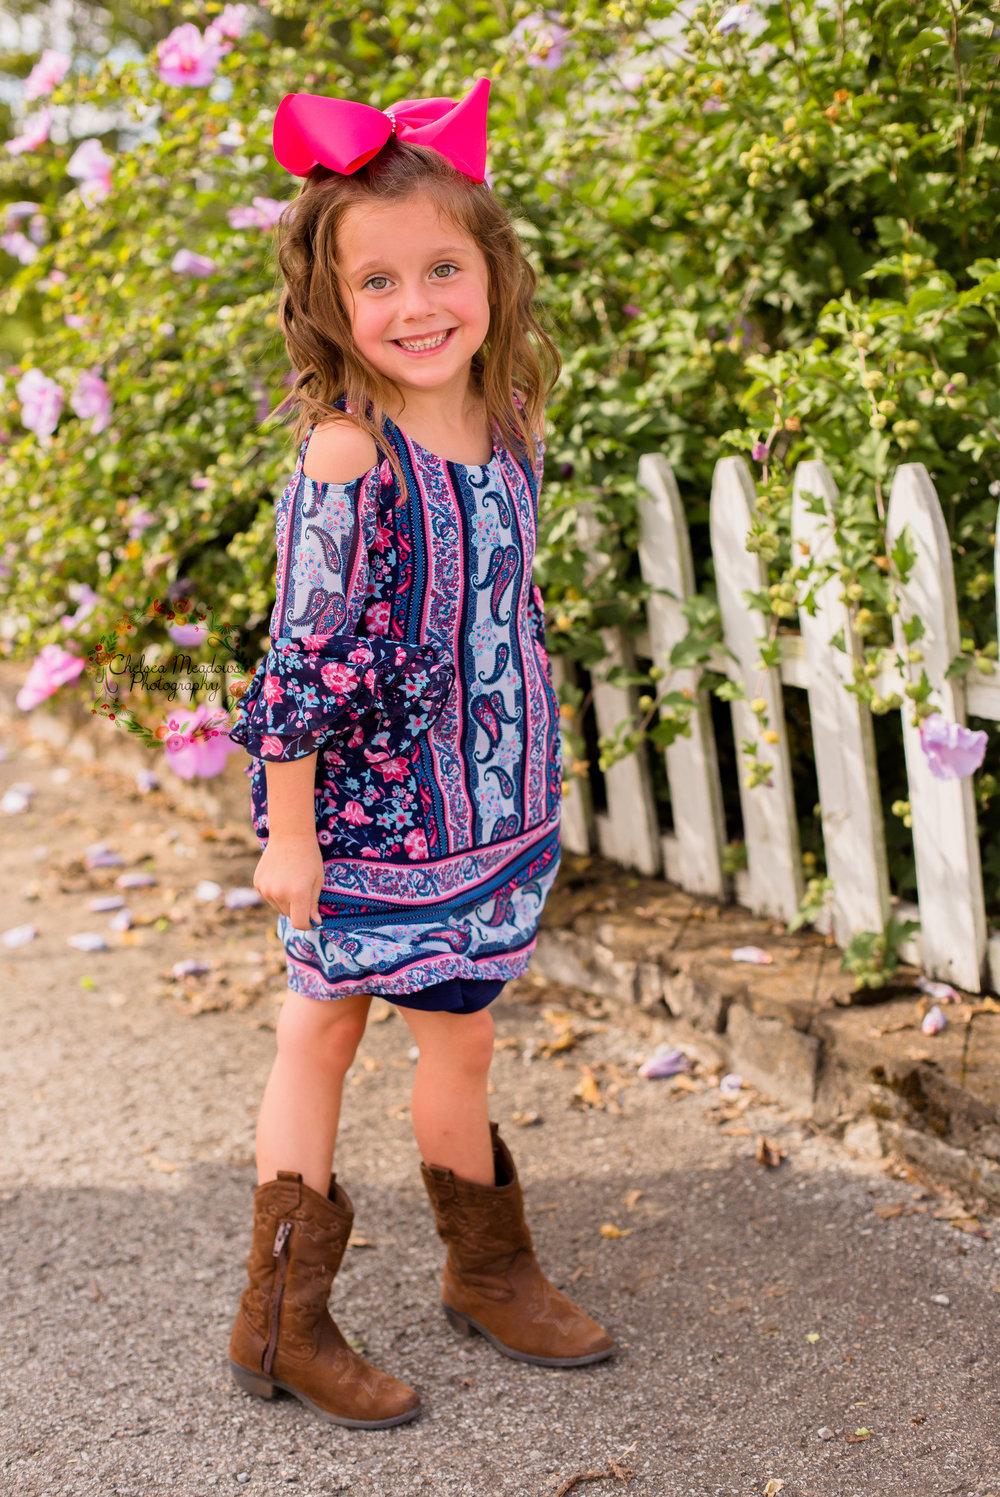 April 6th Birthday - Nashville Family Photographer - Chelsea Meadows Photography (16).jpg